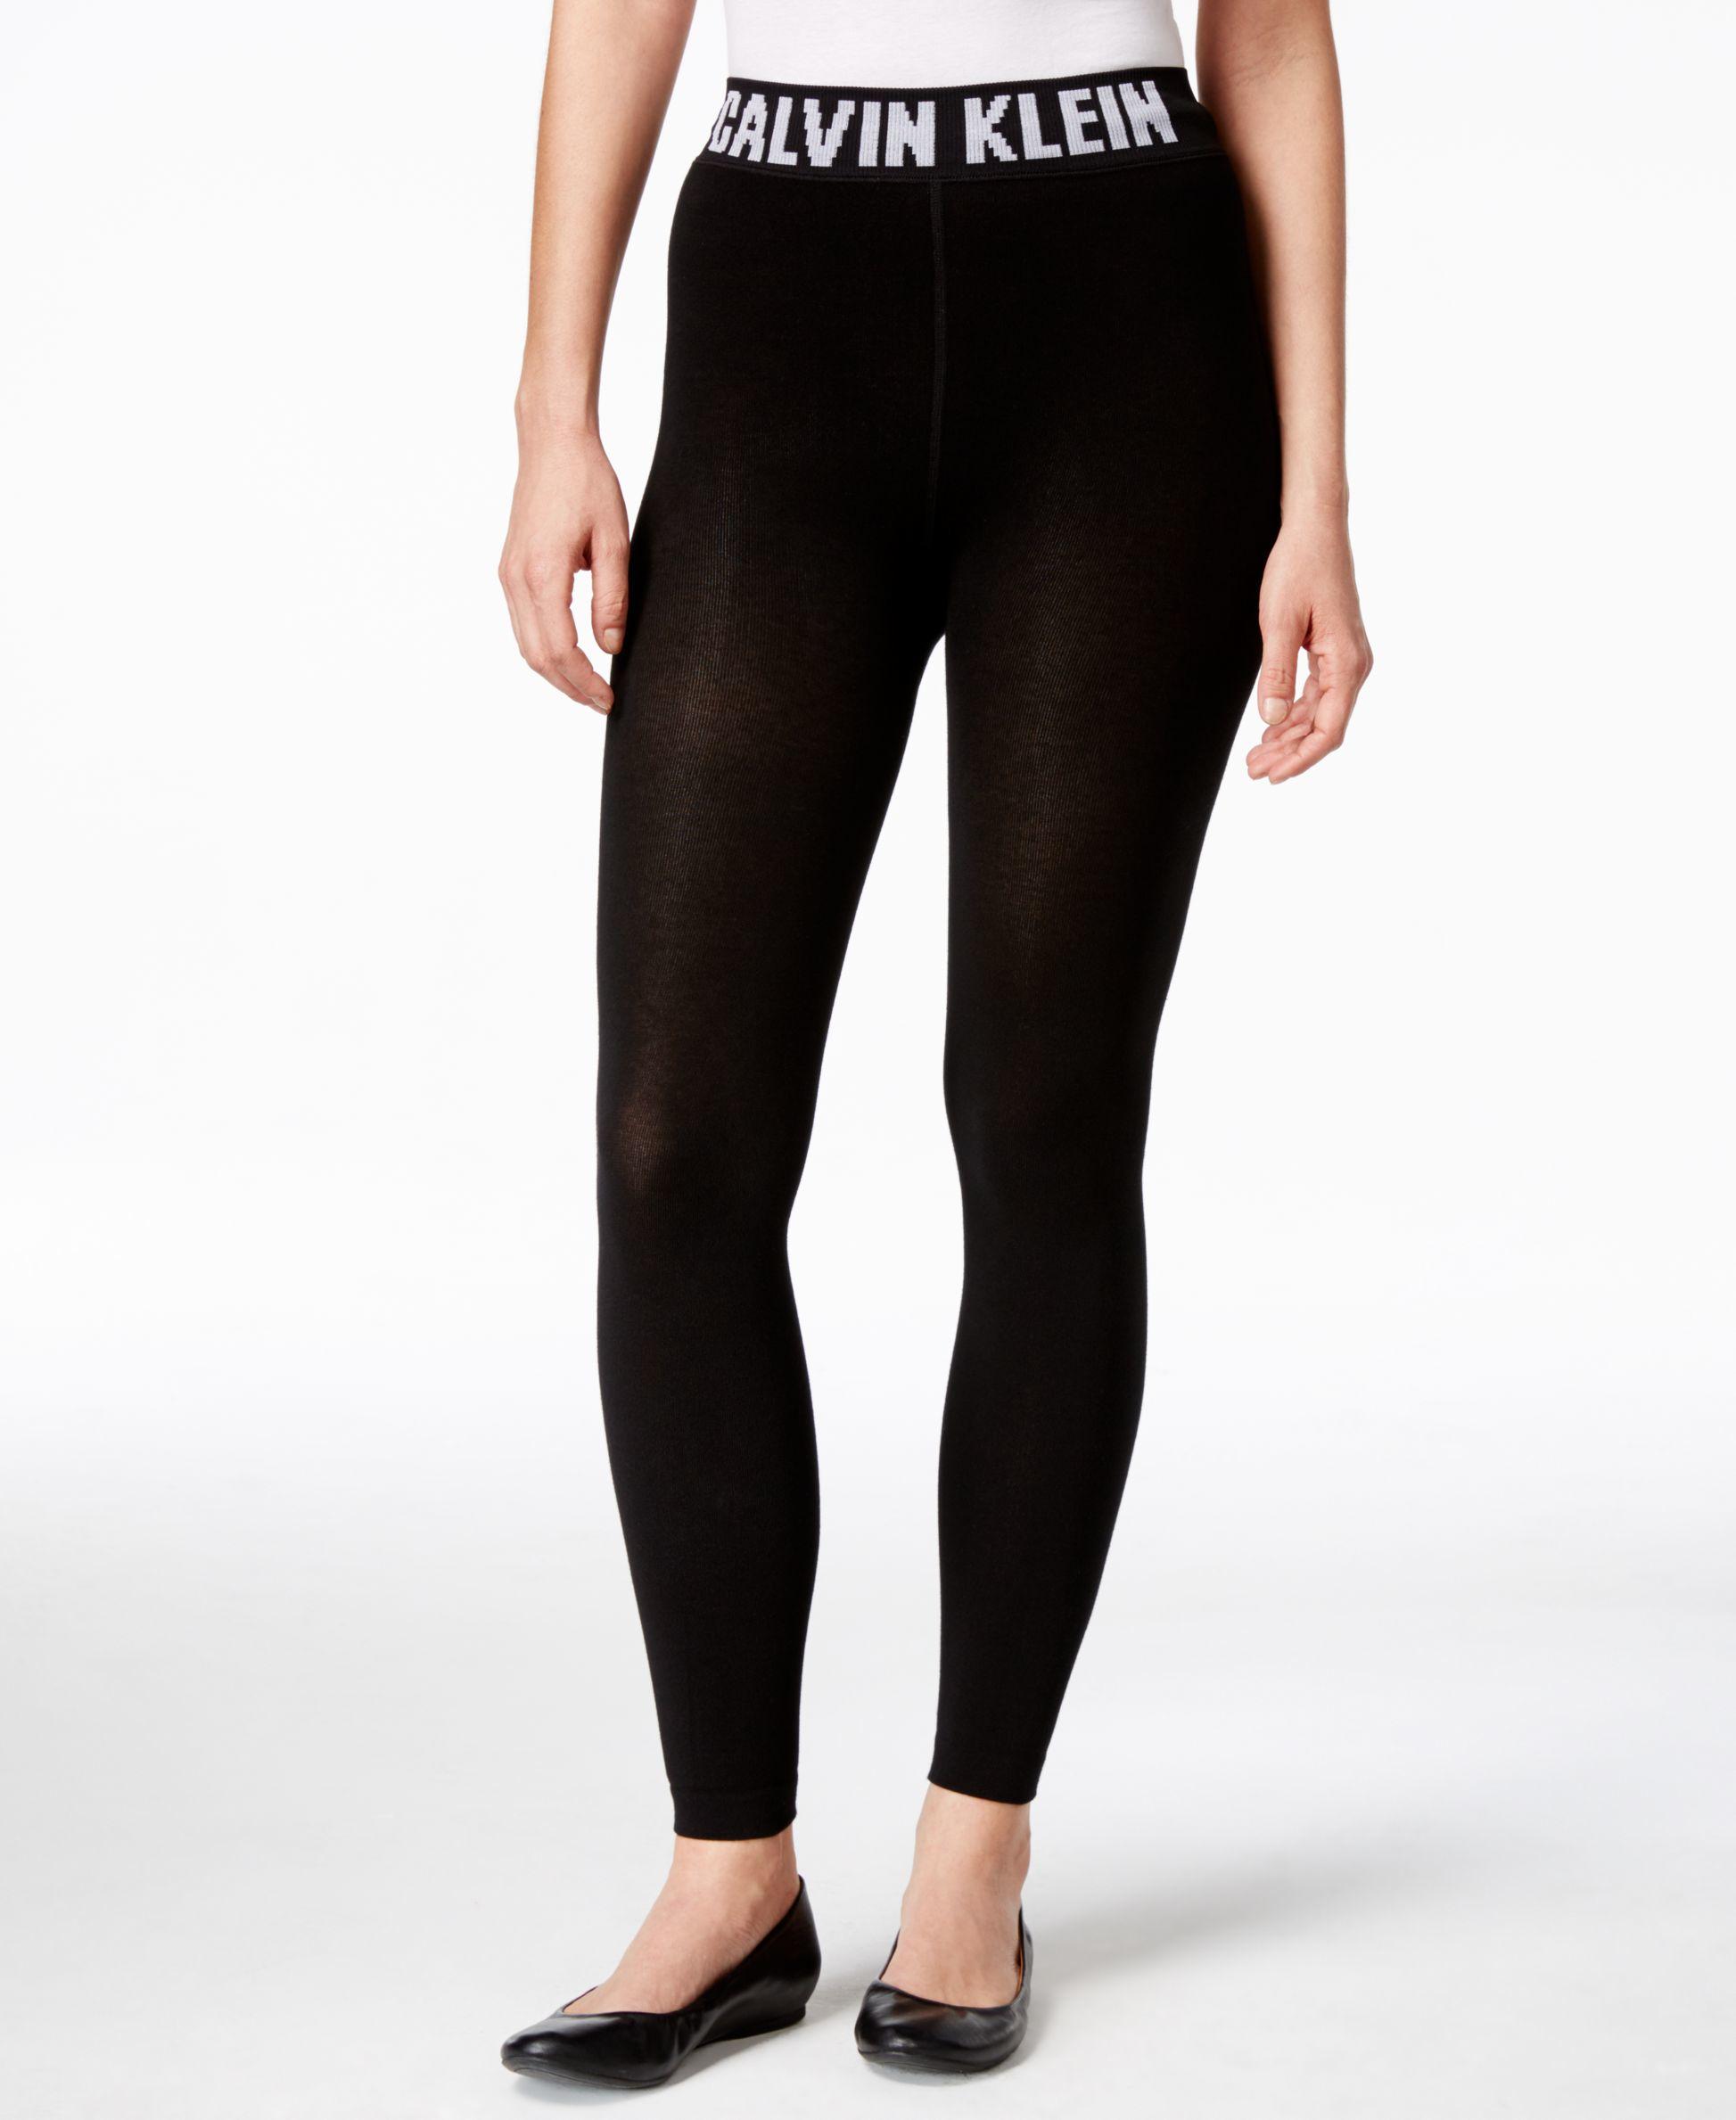 lyst calvin klein retro logo waistband leggings in black. Black Bedroom Furniture Sets. Home Design Ideas